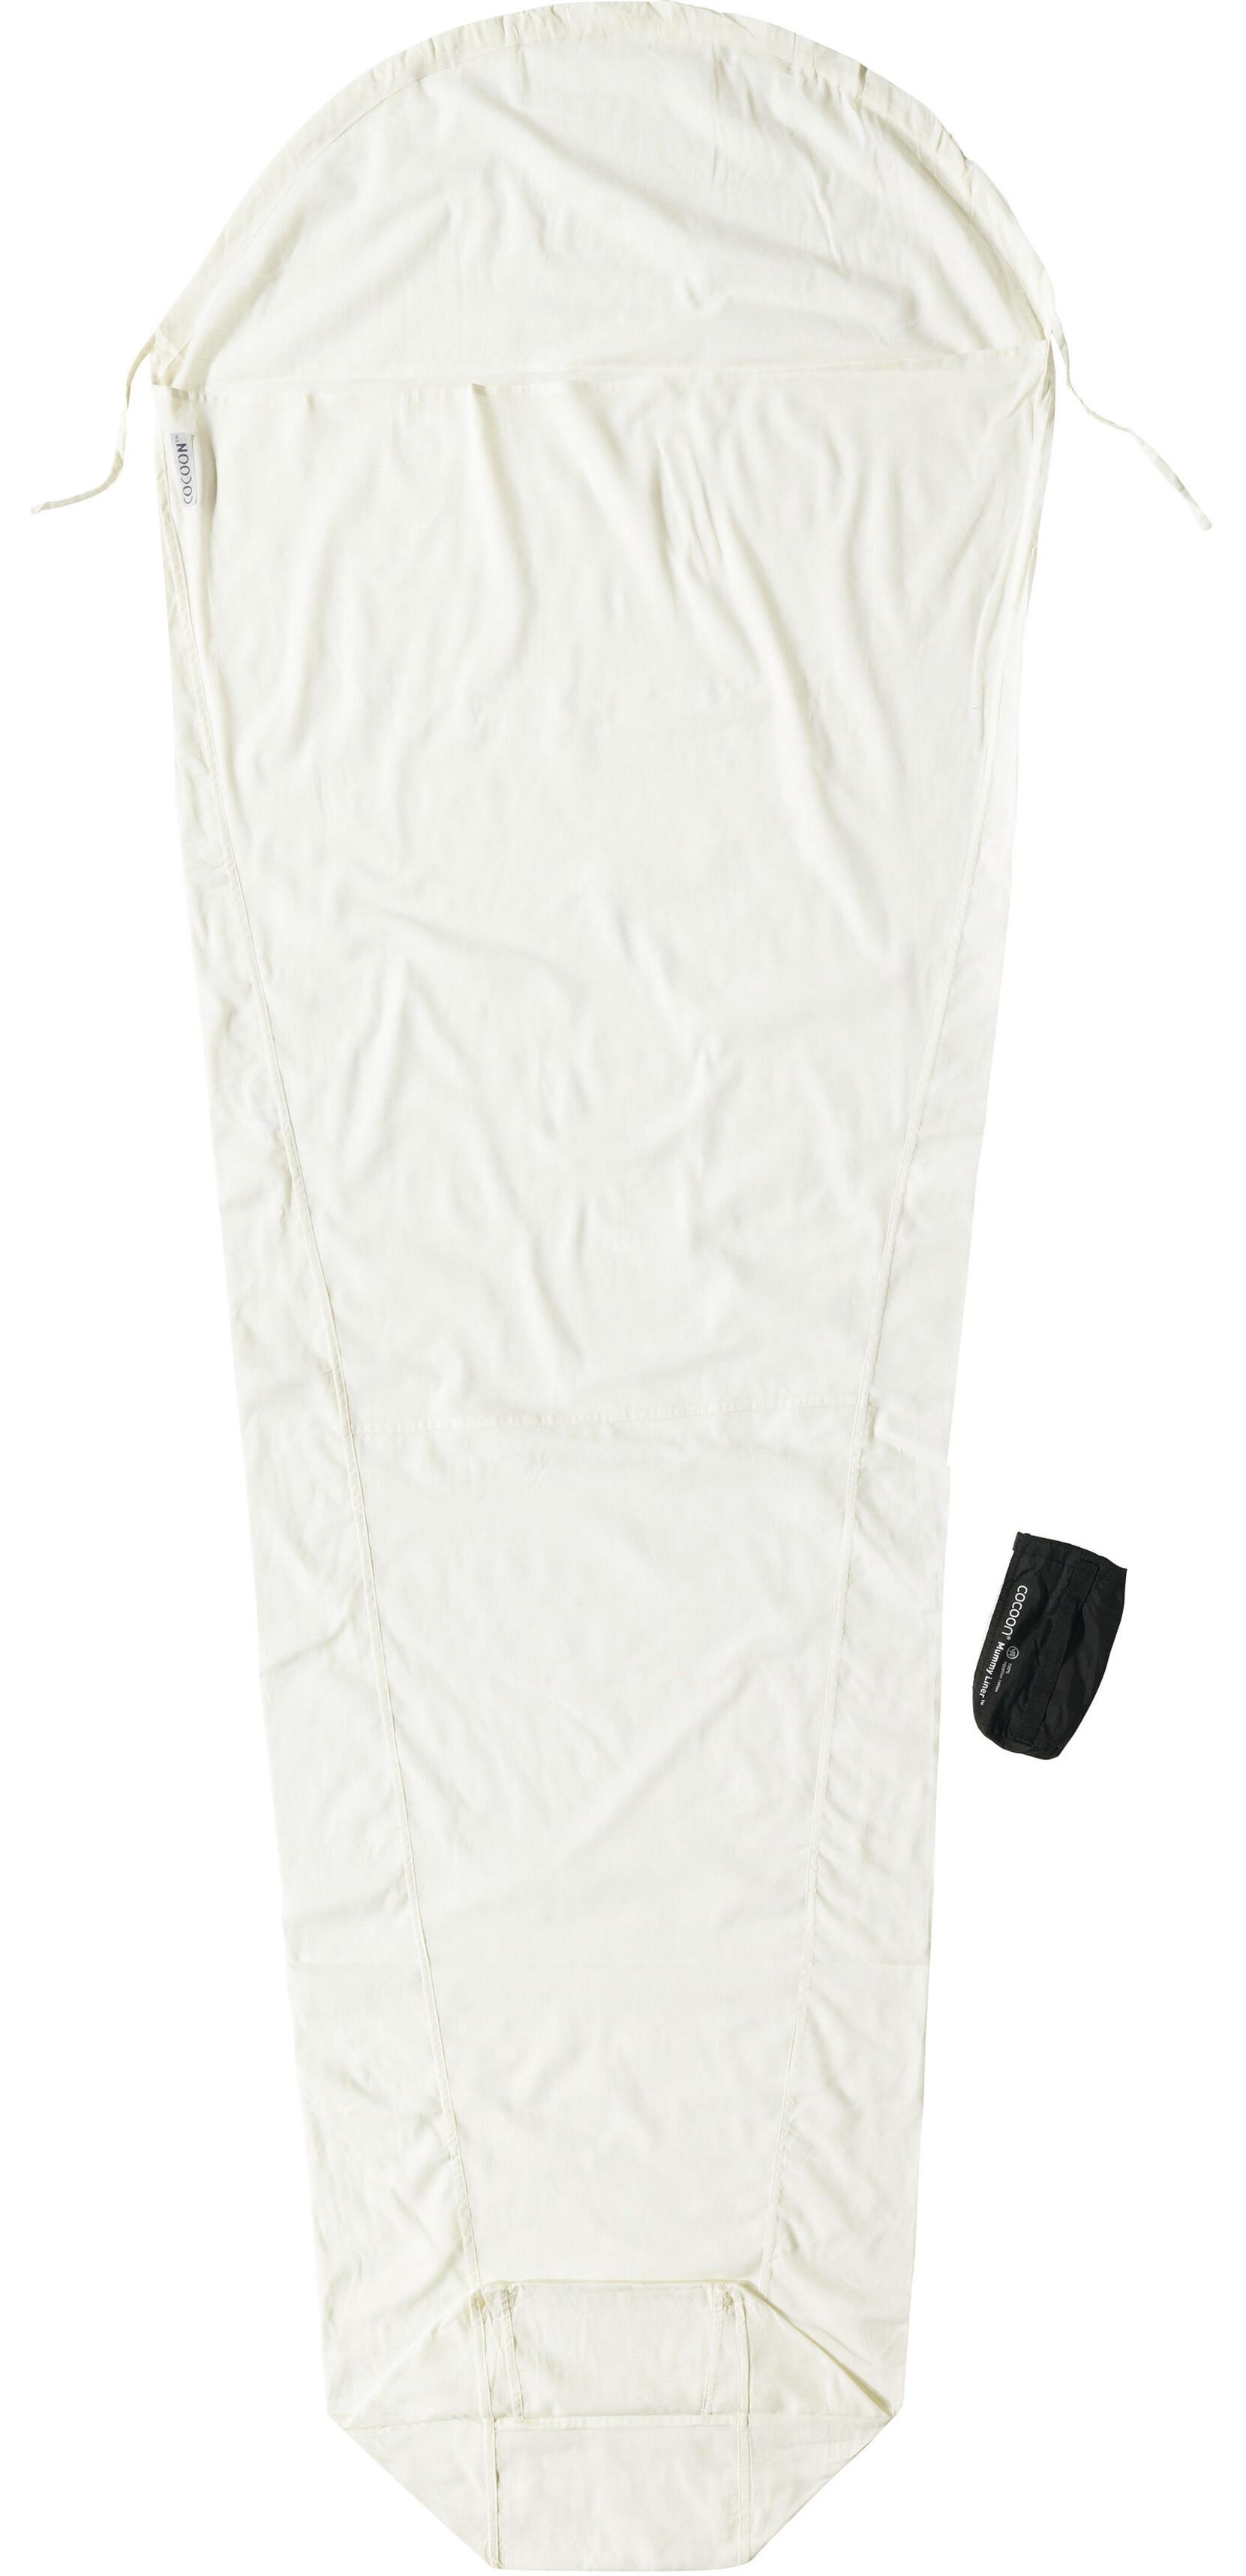 cocoon drap sac de couchage en coton cru sur. Black Bedroom Furniture Sets. Home Design Ideas